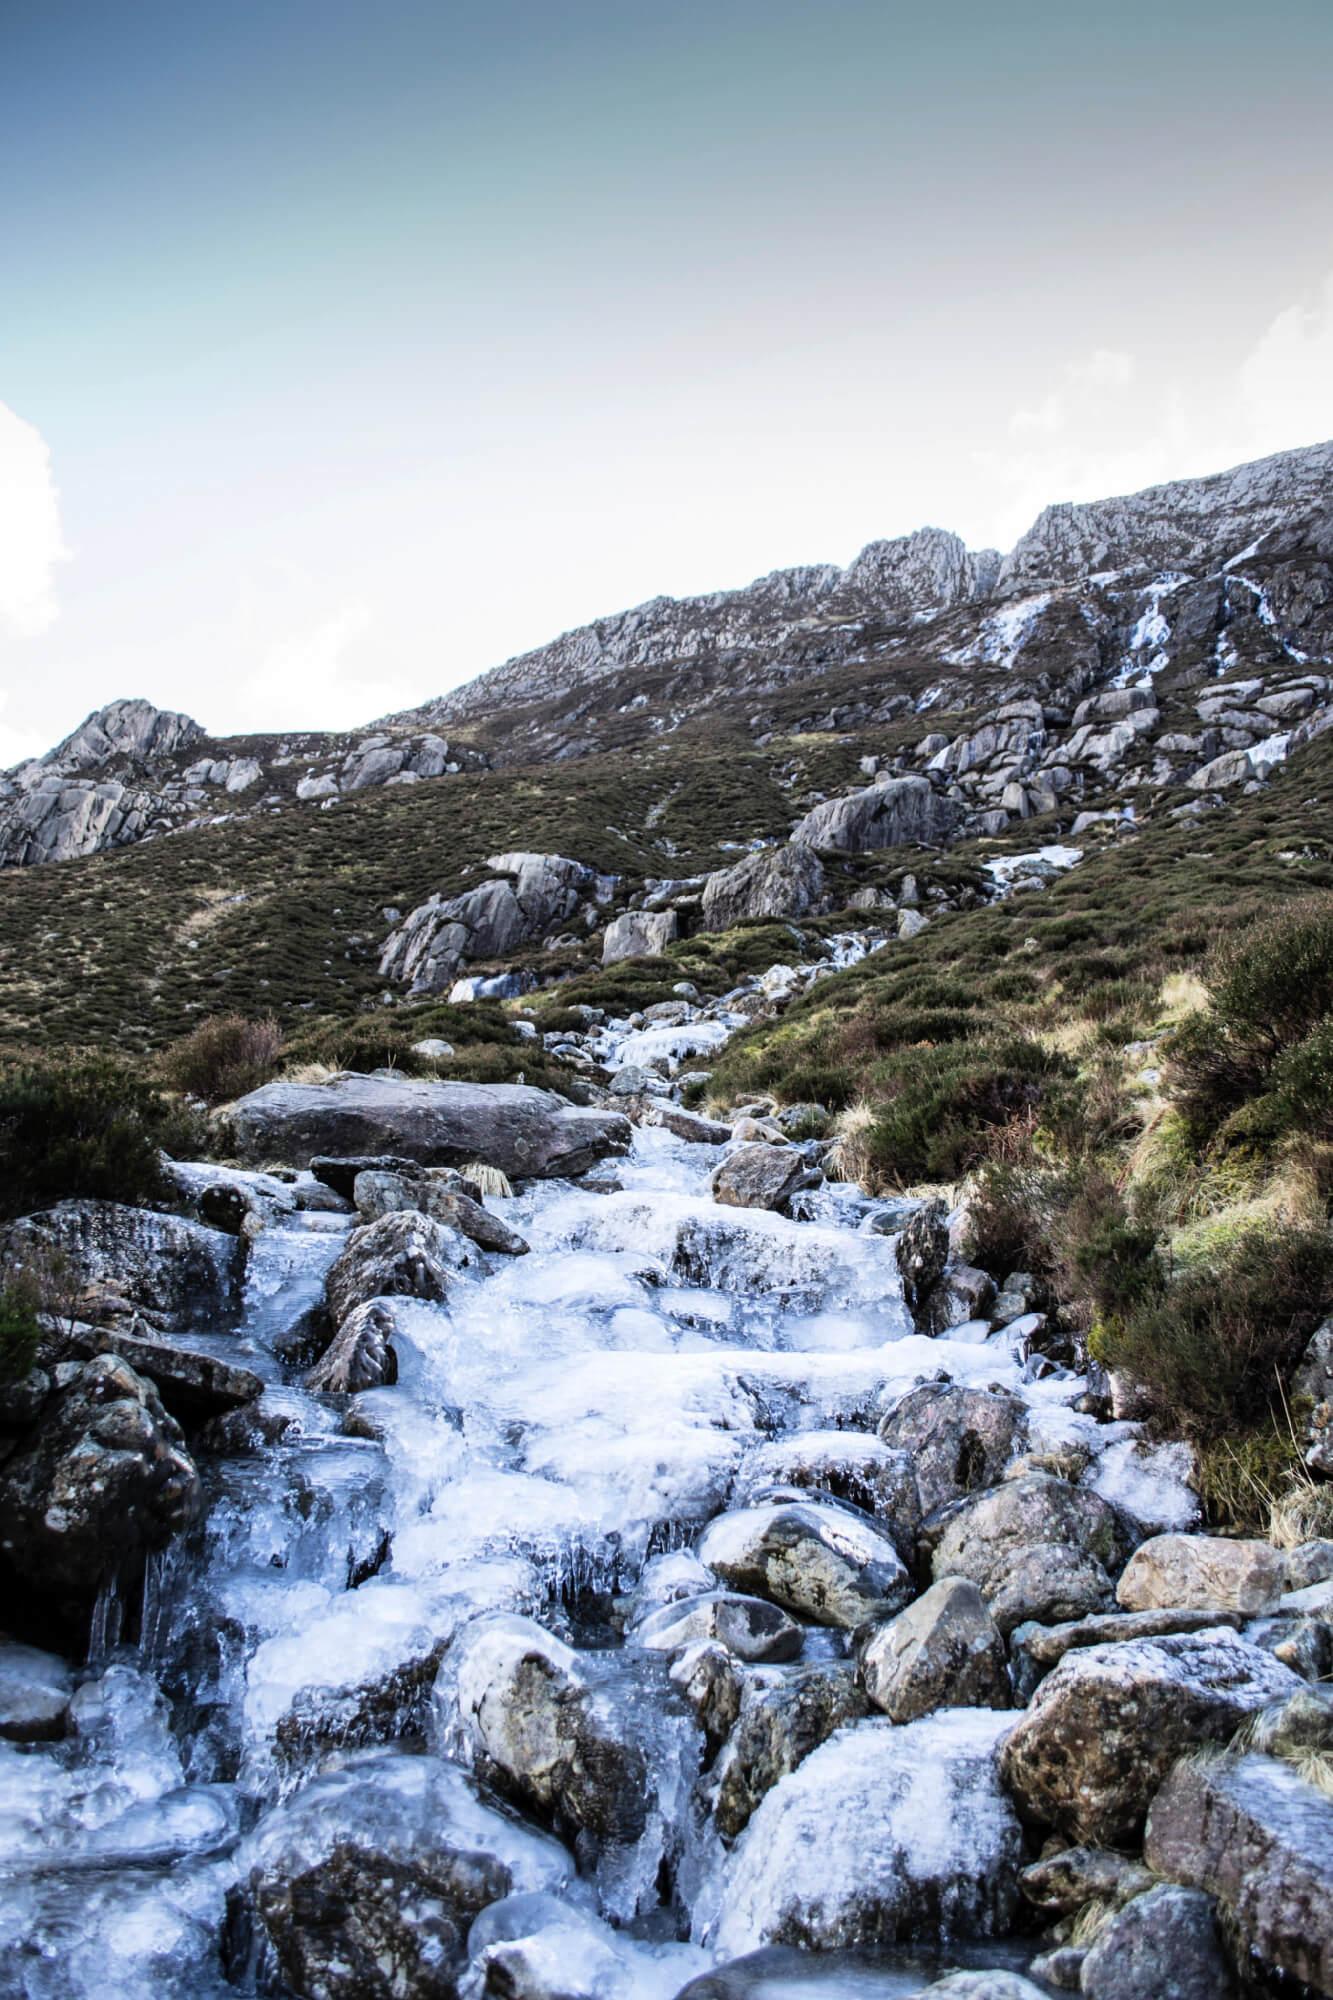 Bangor, Snowdonia National Park